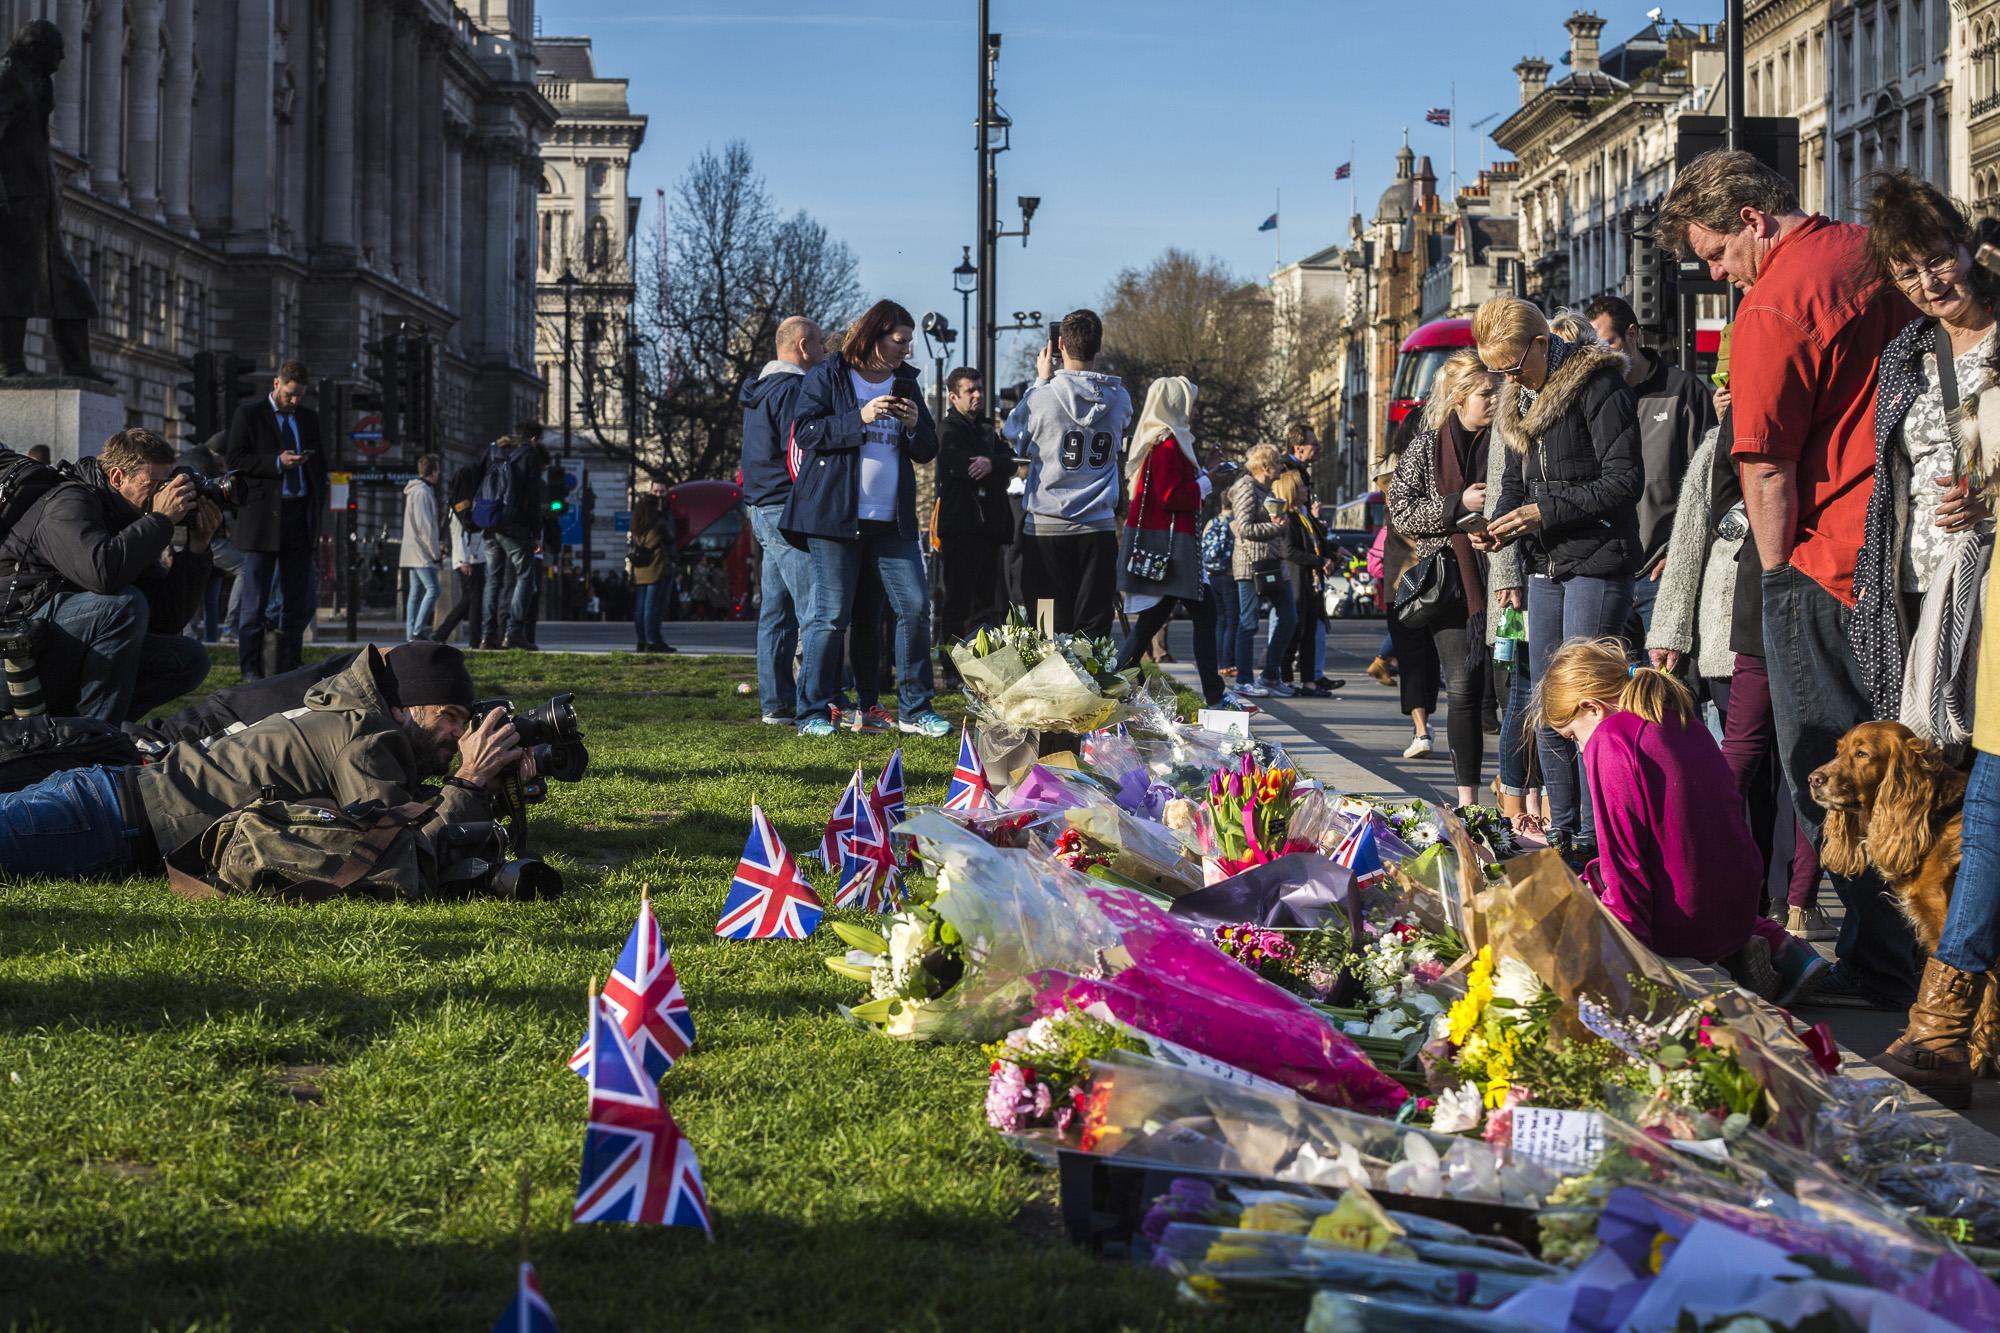 London_Attack_Hope_Not_Hate-34.jpg